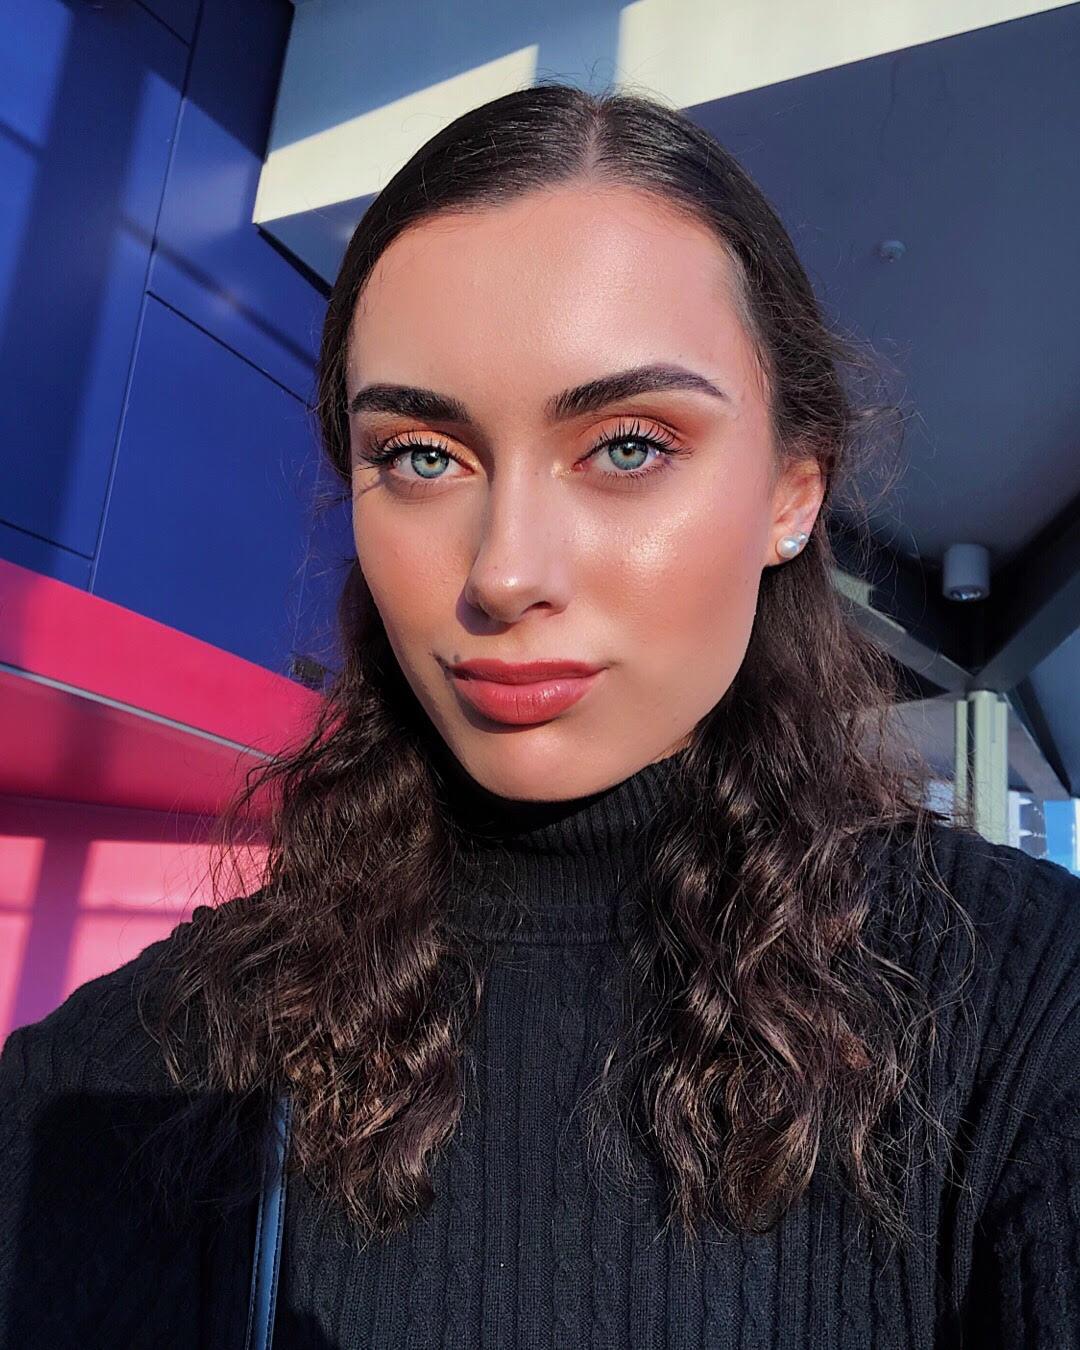 Sejla Ceric